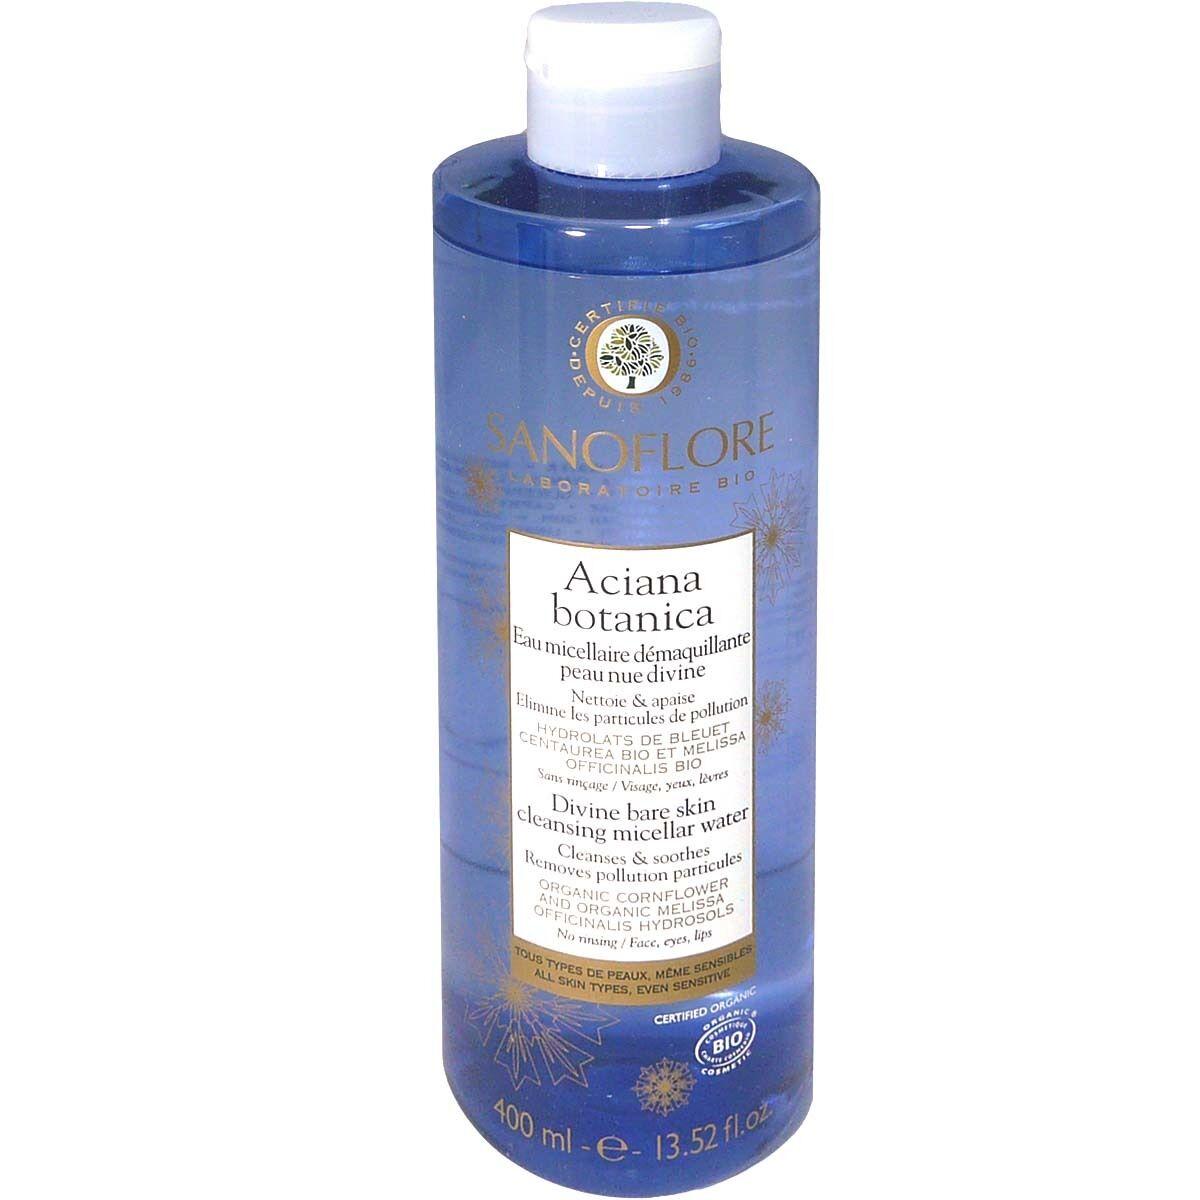 Sanoflore aciana botanica eau micellaire 400 ml